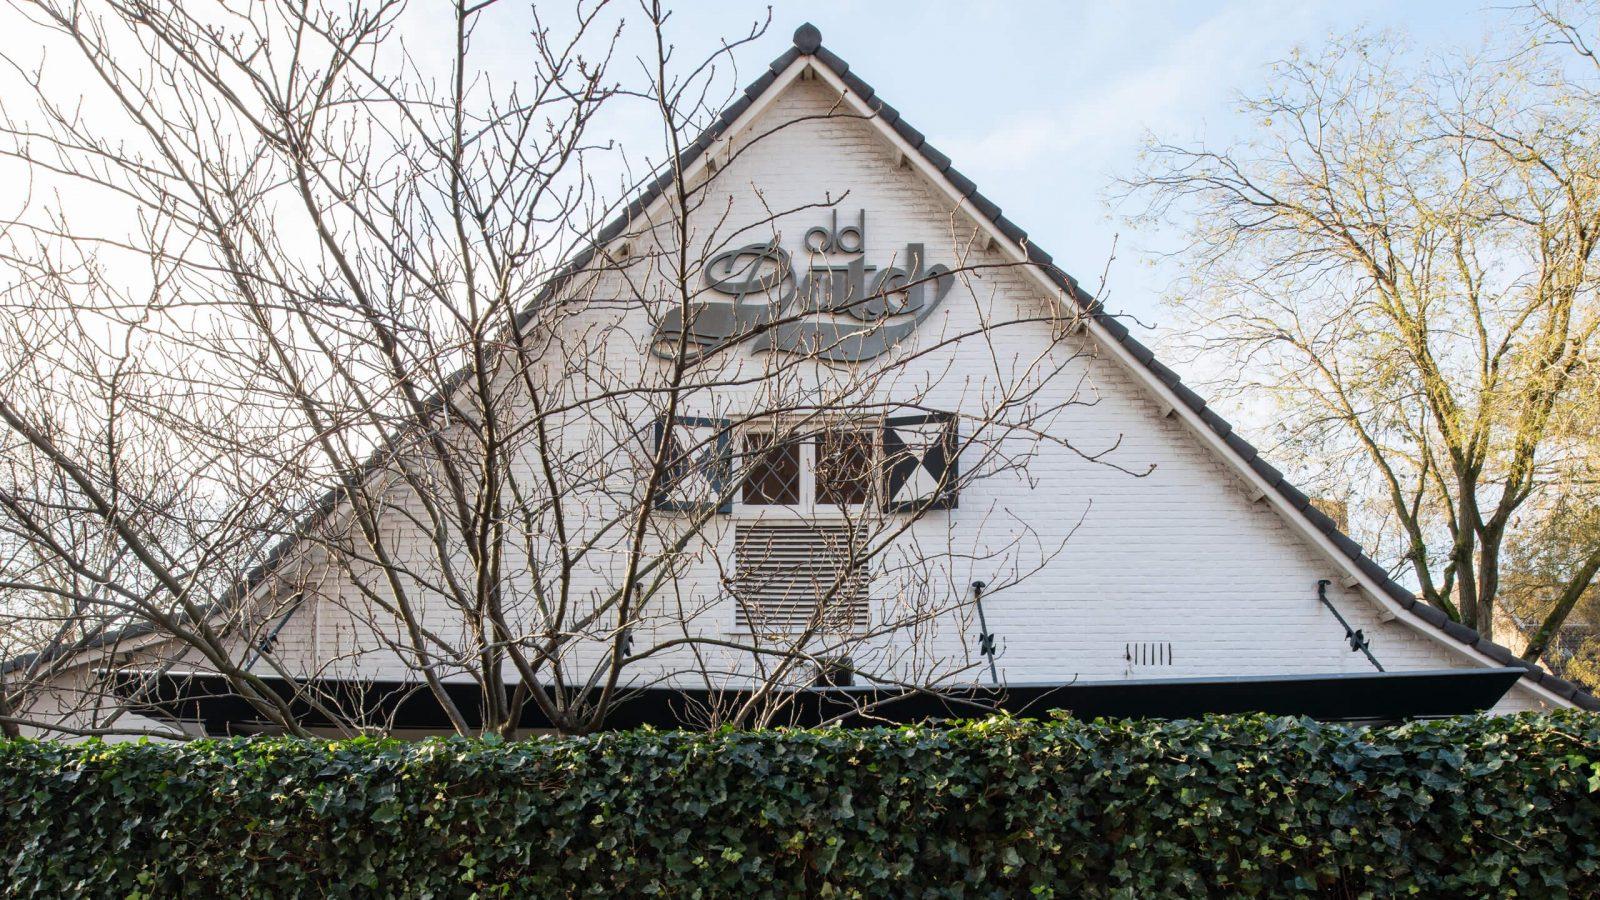 2021 Marlies Lageweg DSC 5255 Old Dutch